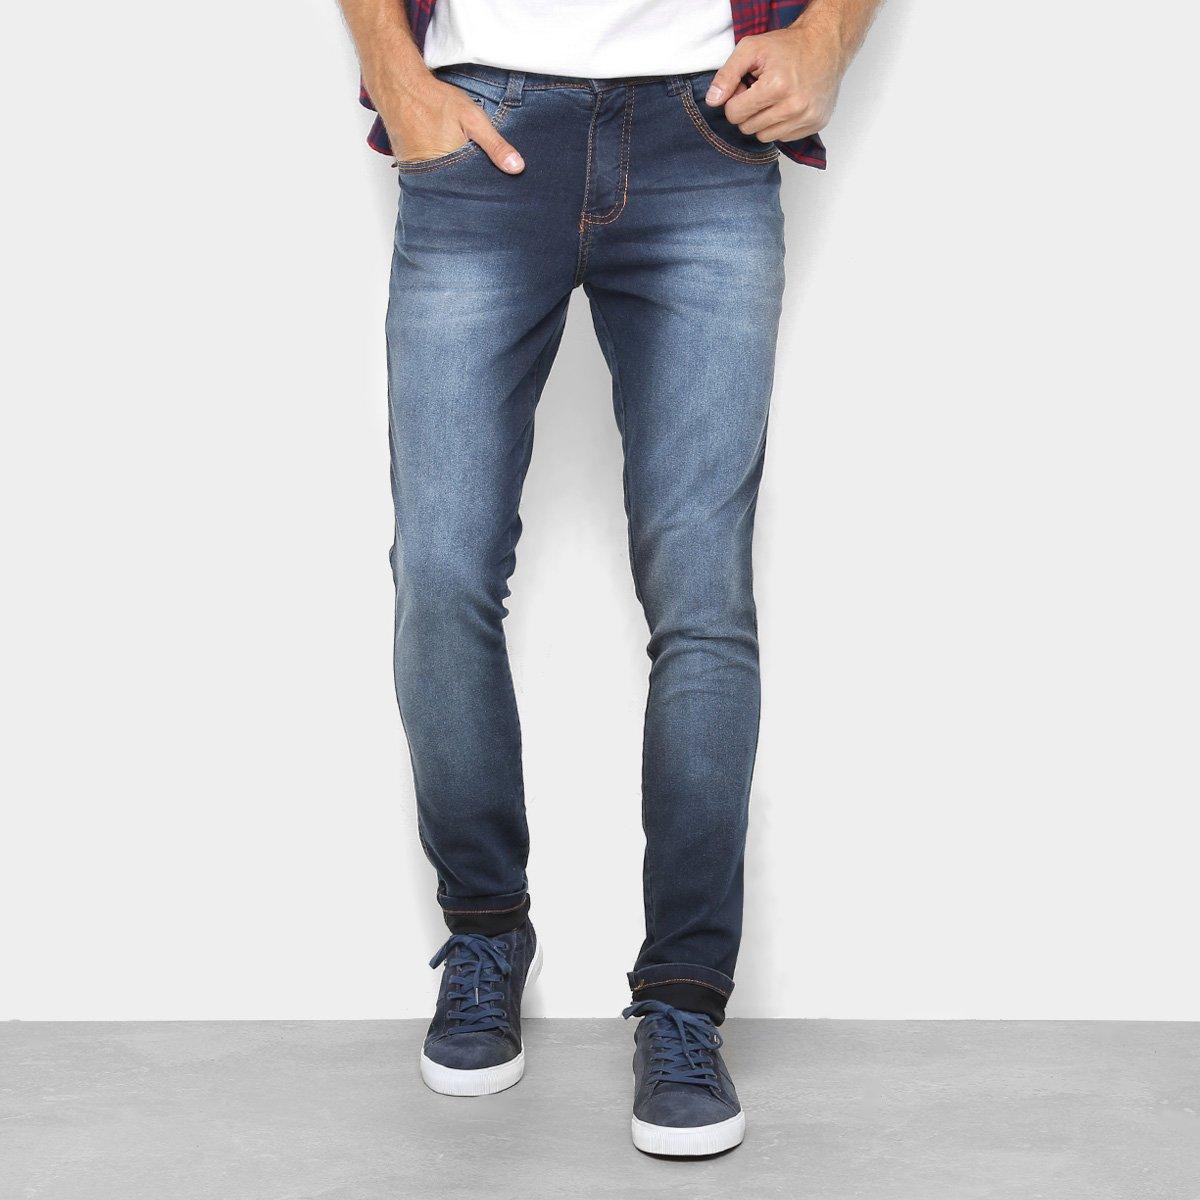 956153837 Calça Jeans Skinny Biotipo Estonada Cintura Média Masculina - Tam: ...